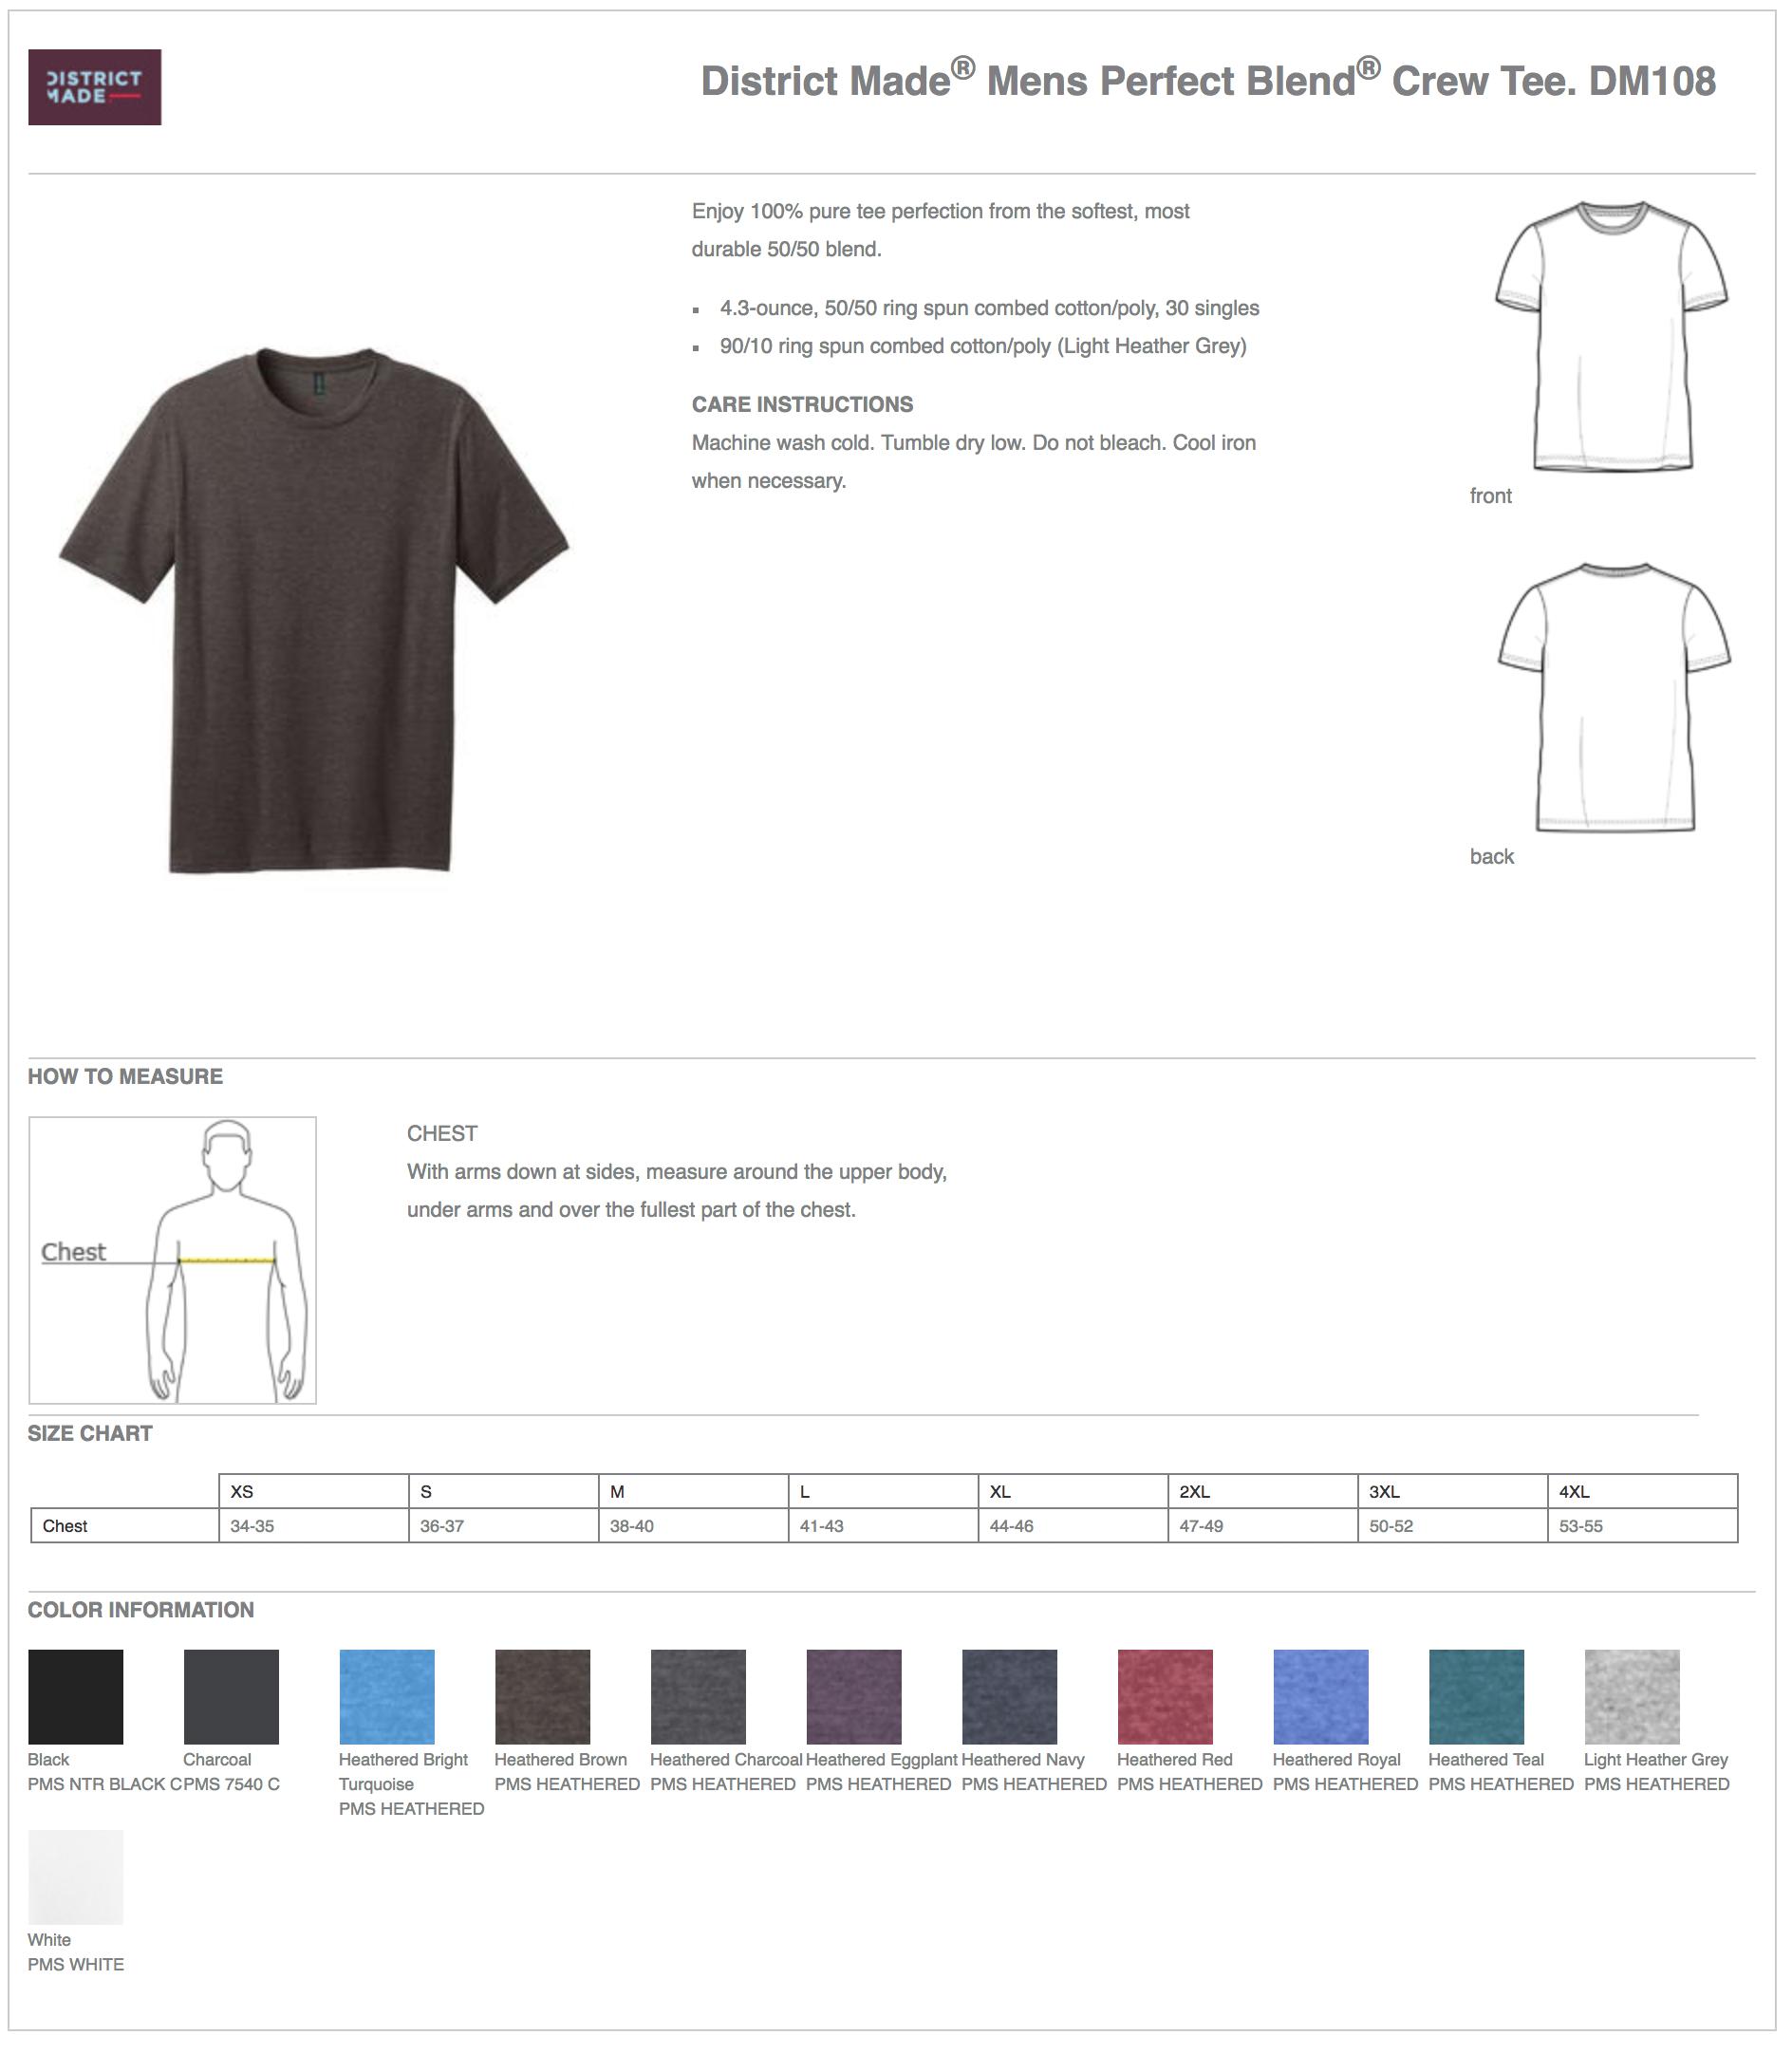 District Made Soft Feel 5050 Custom T Shirts Elevation Sports